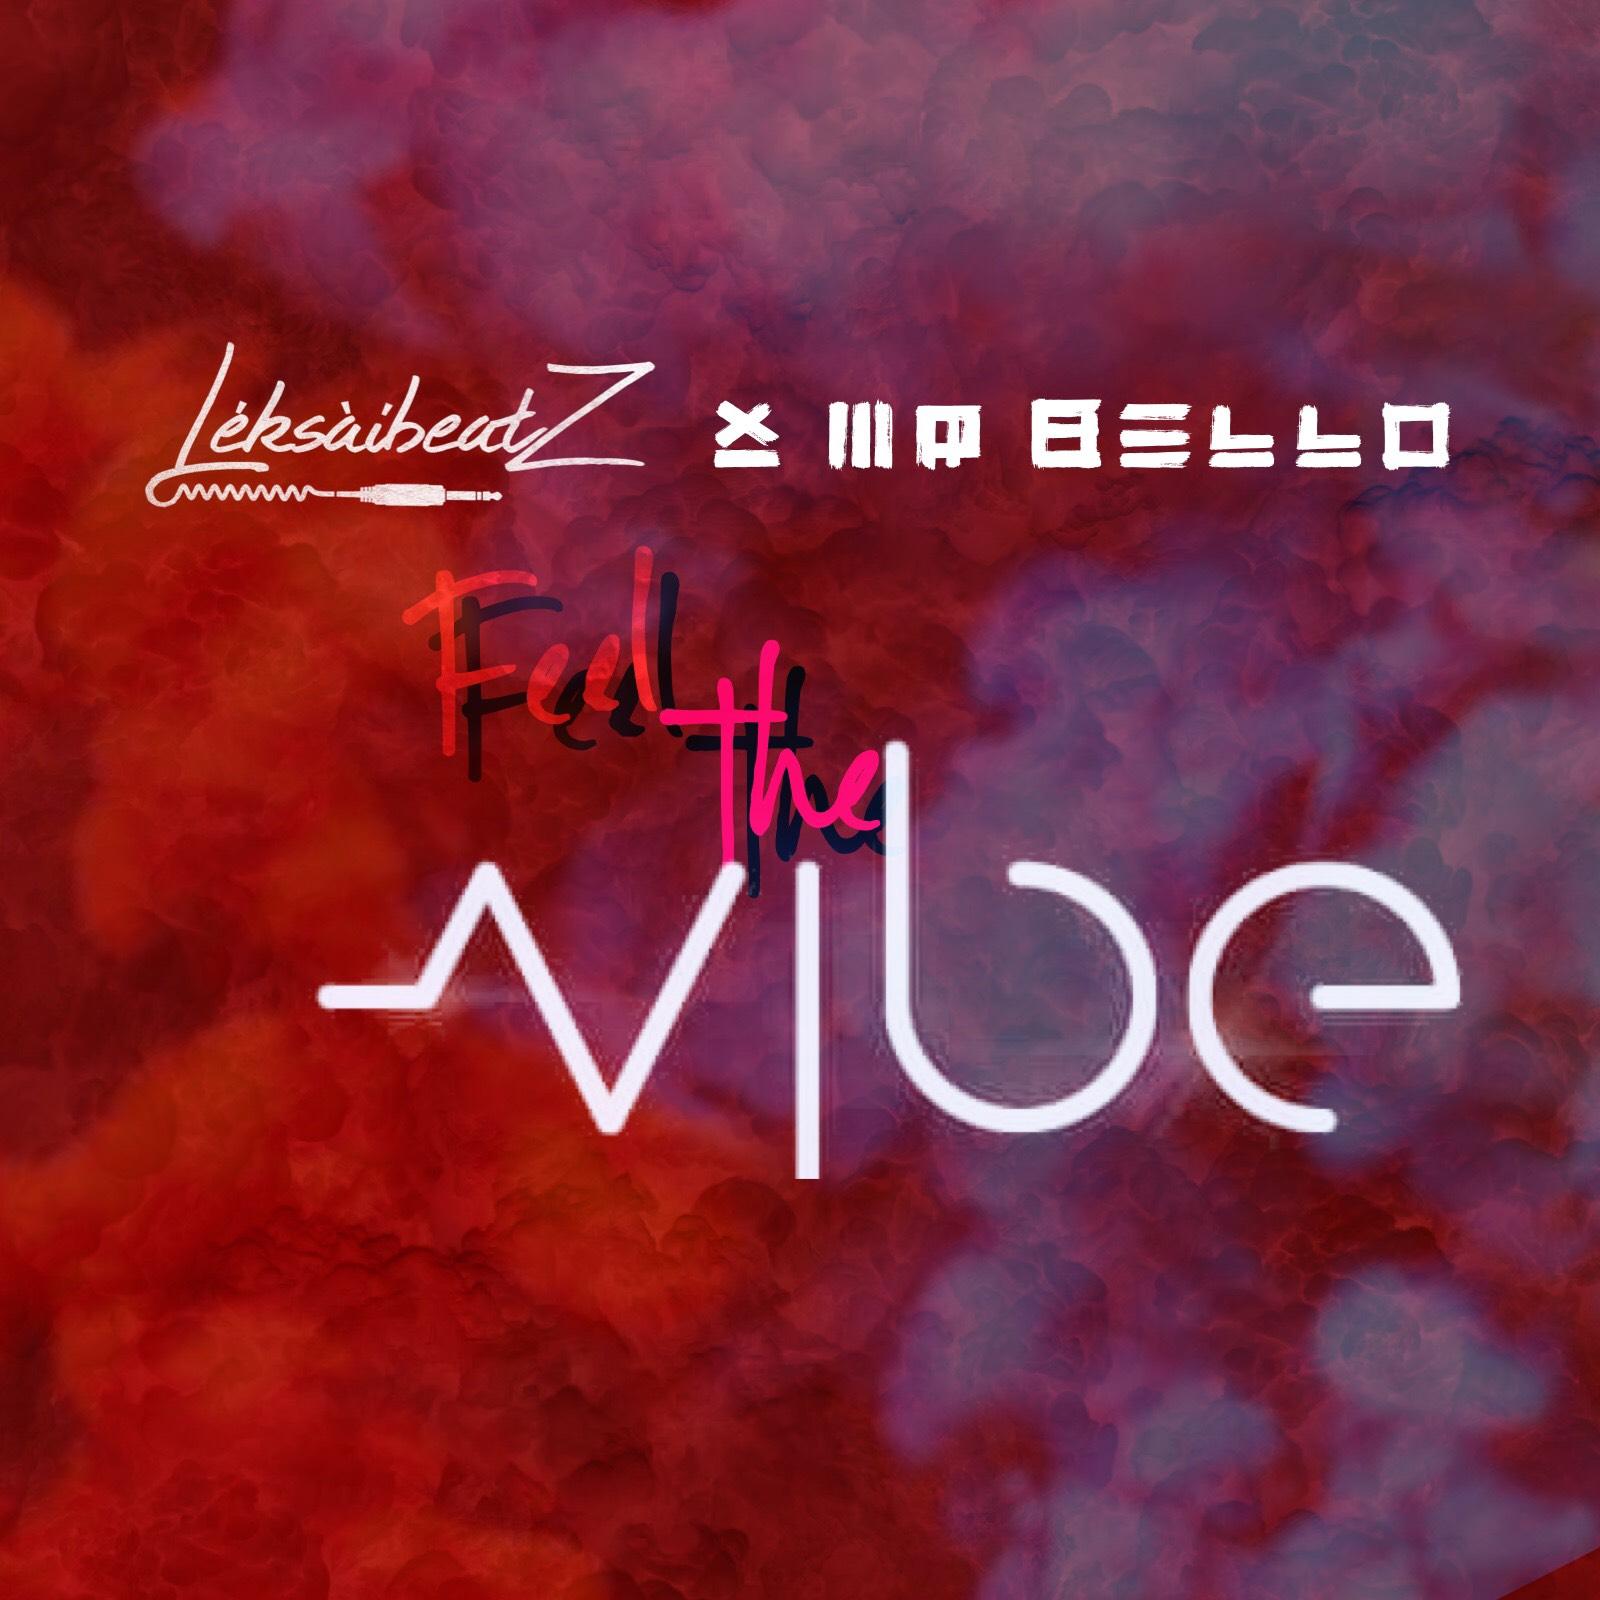 Leksaibeatz x Mr Bello – Feel the Vibe